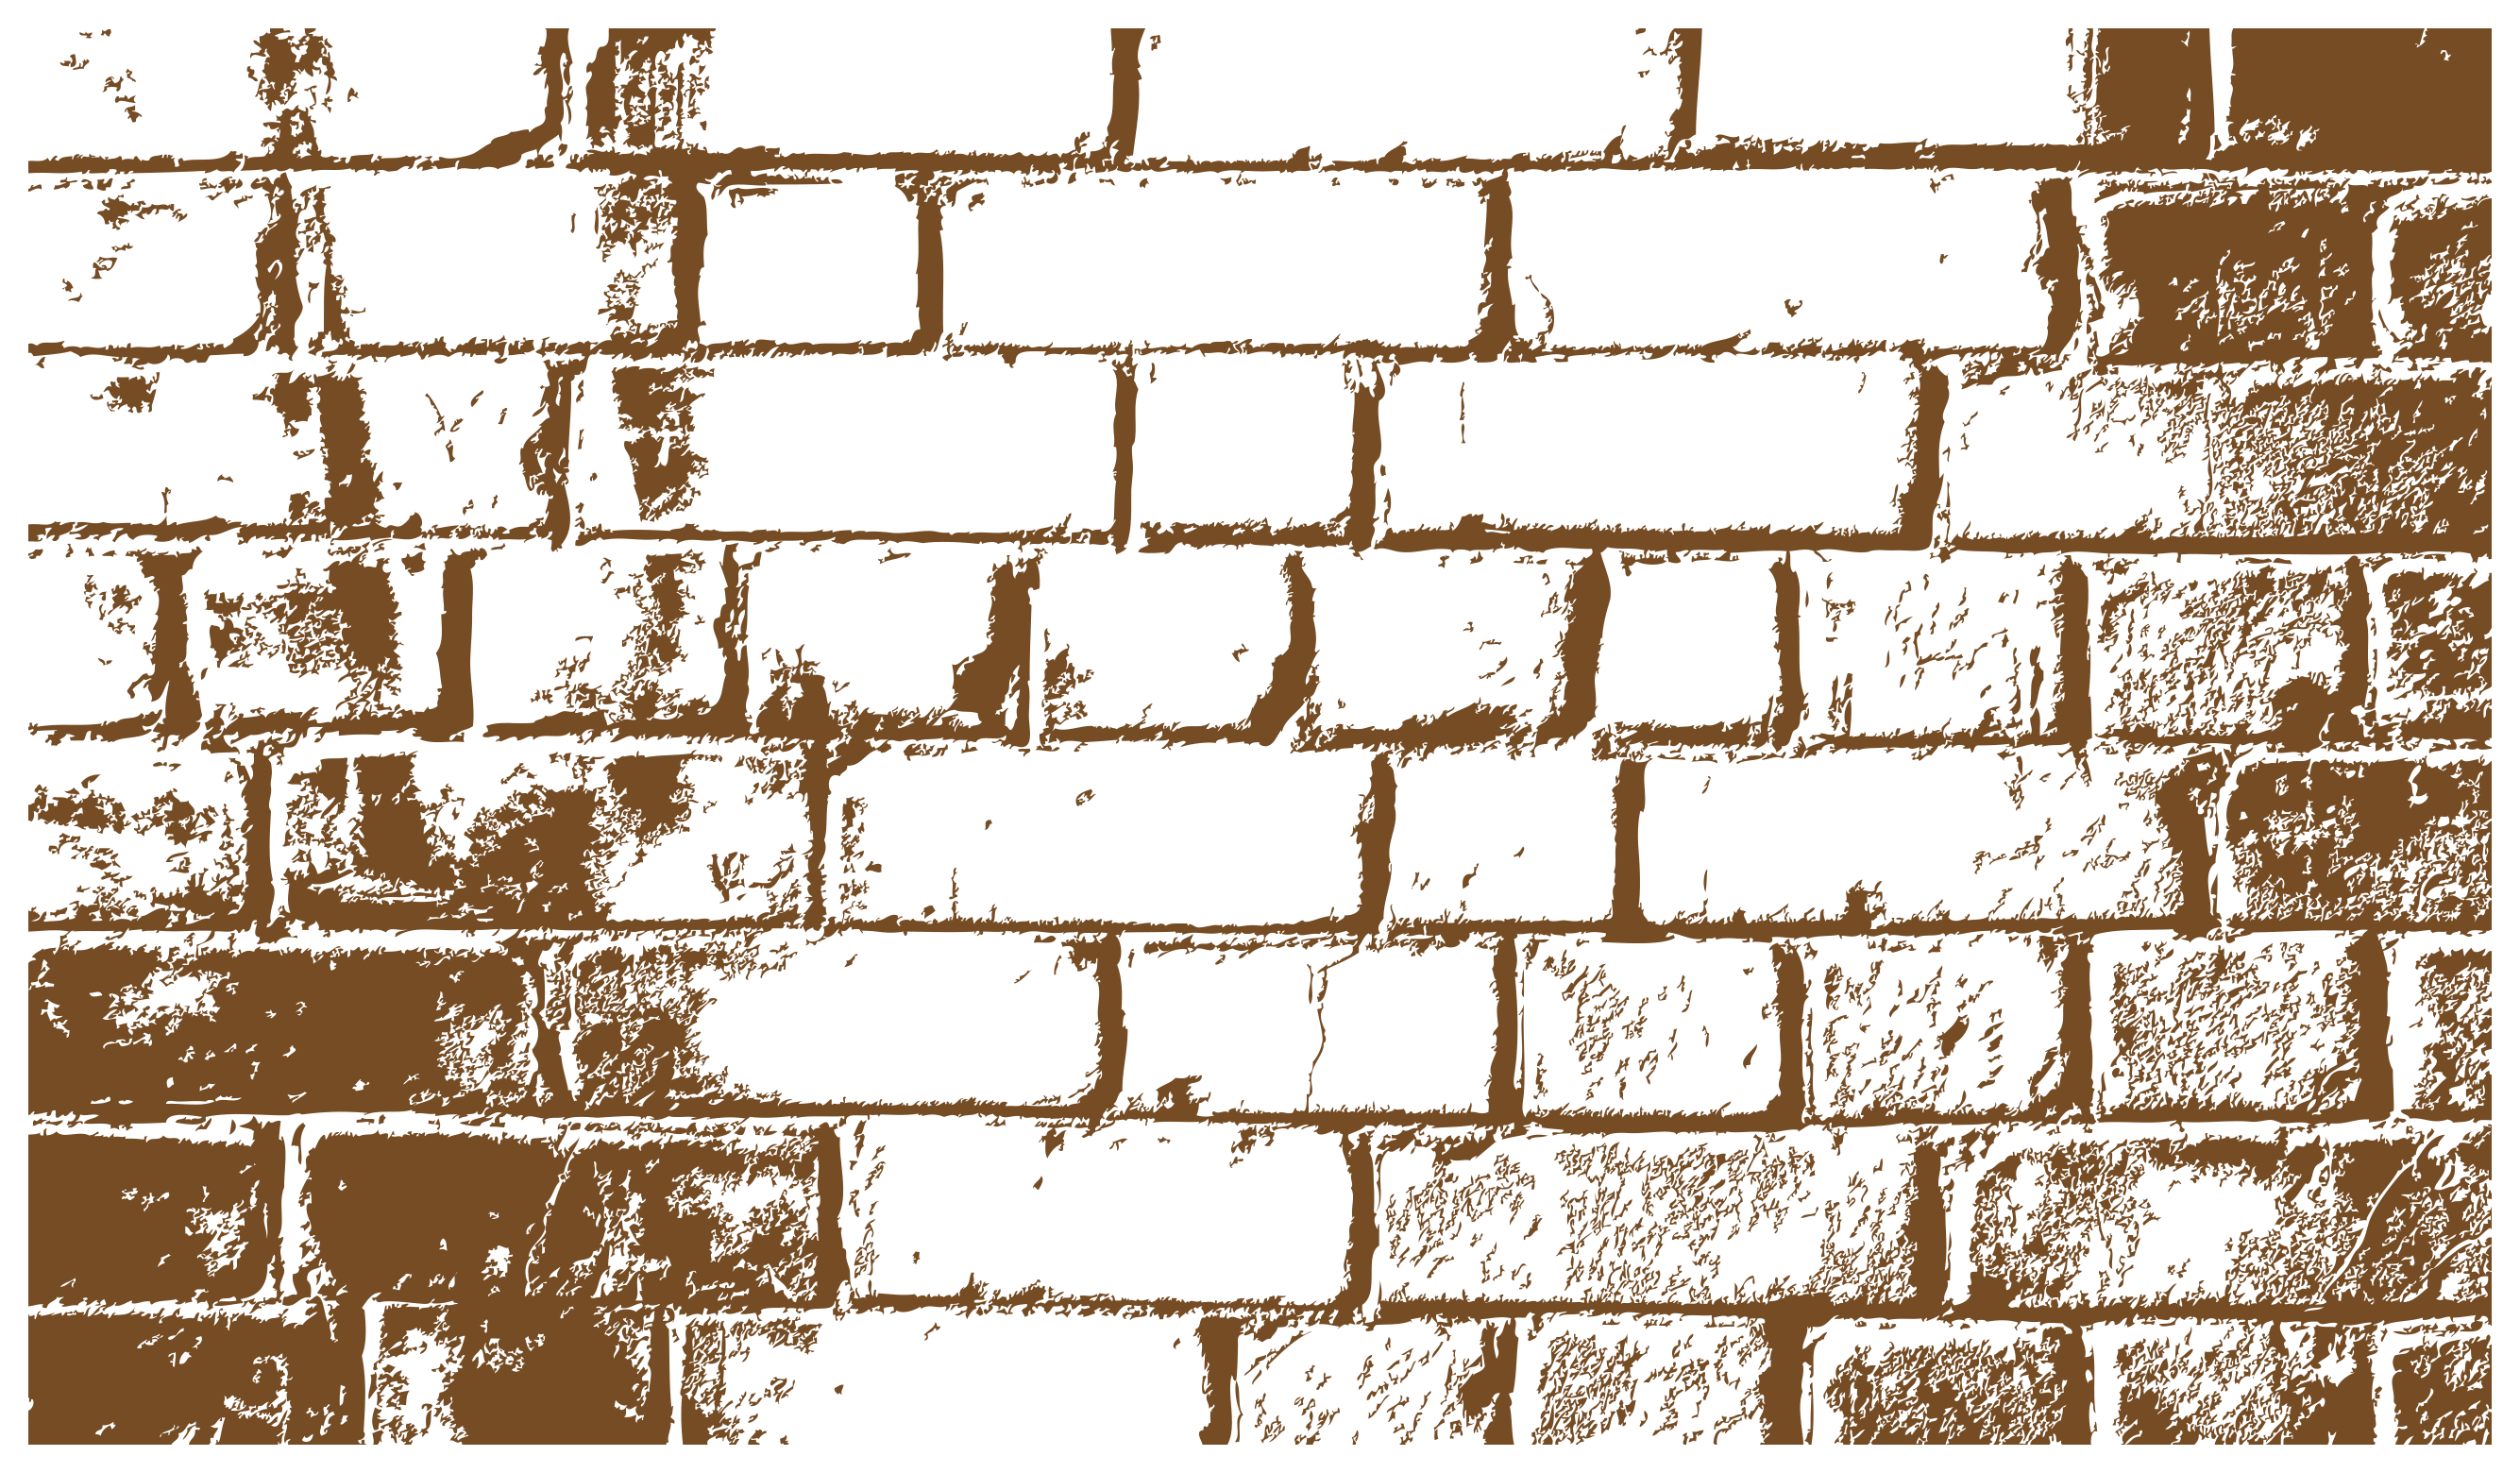 Brick Wall Vector Free Download at GetDrawings   Free download